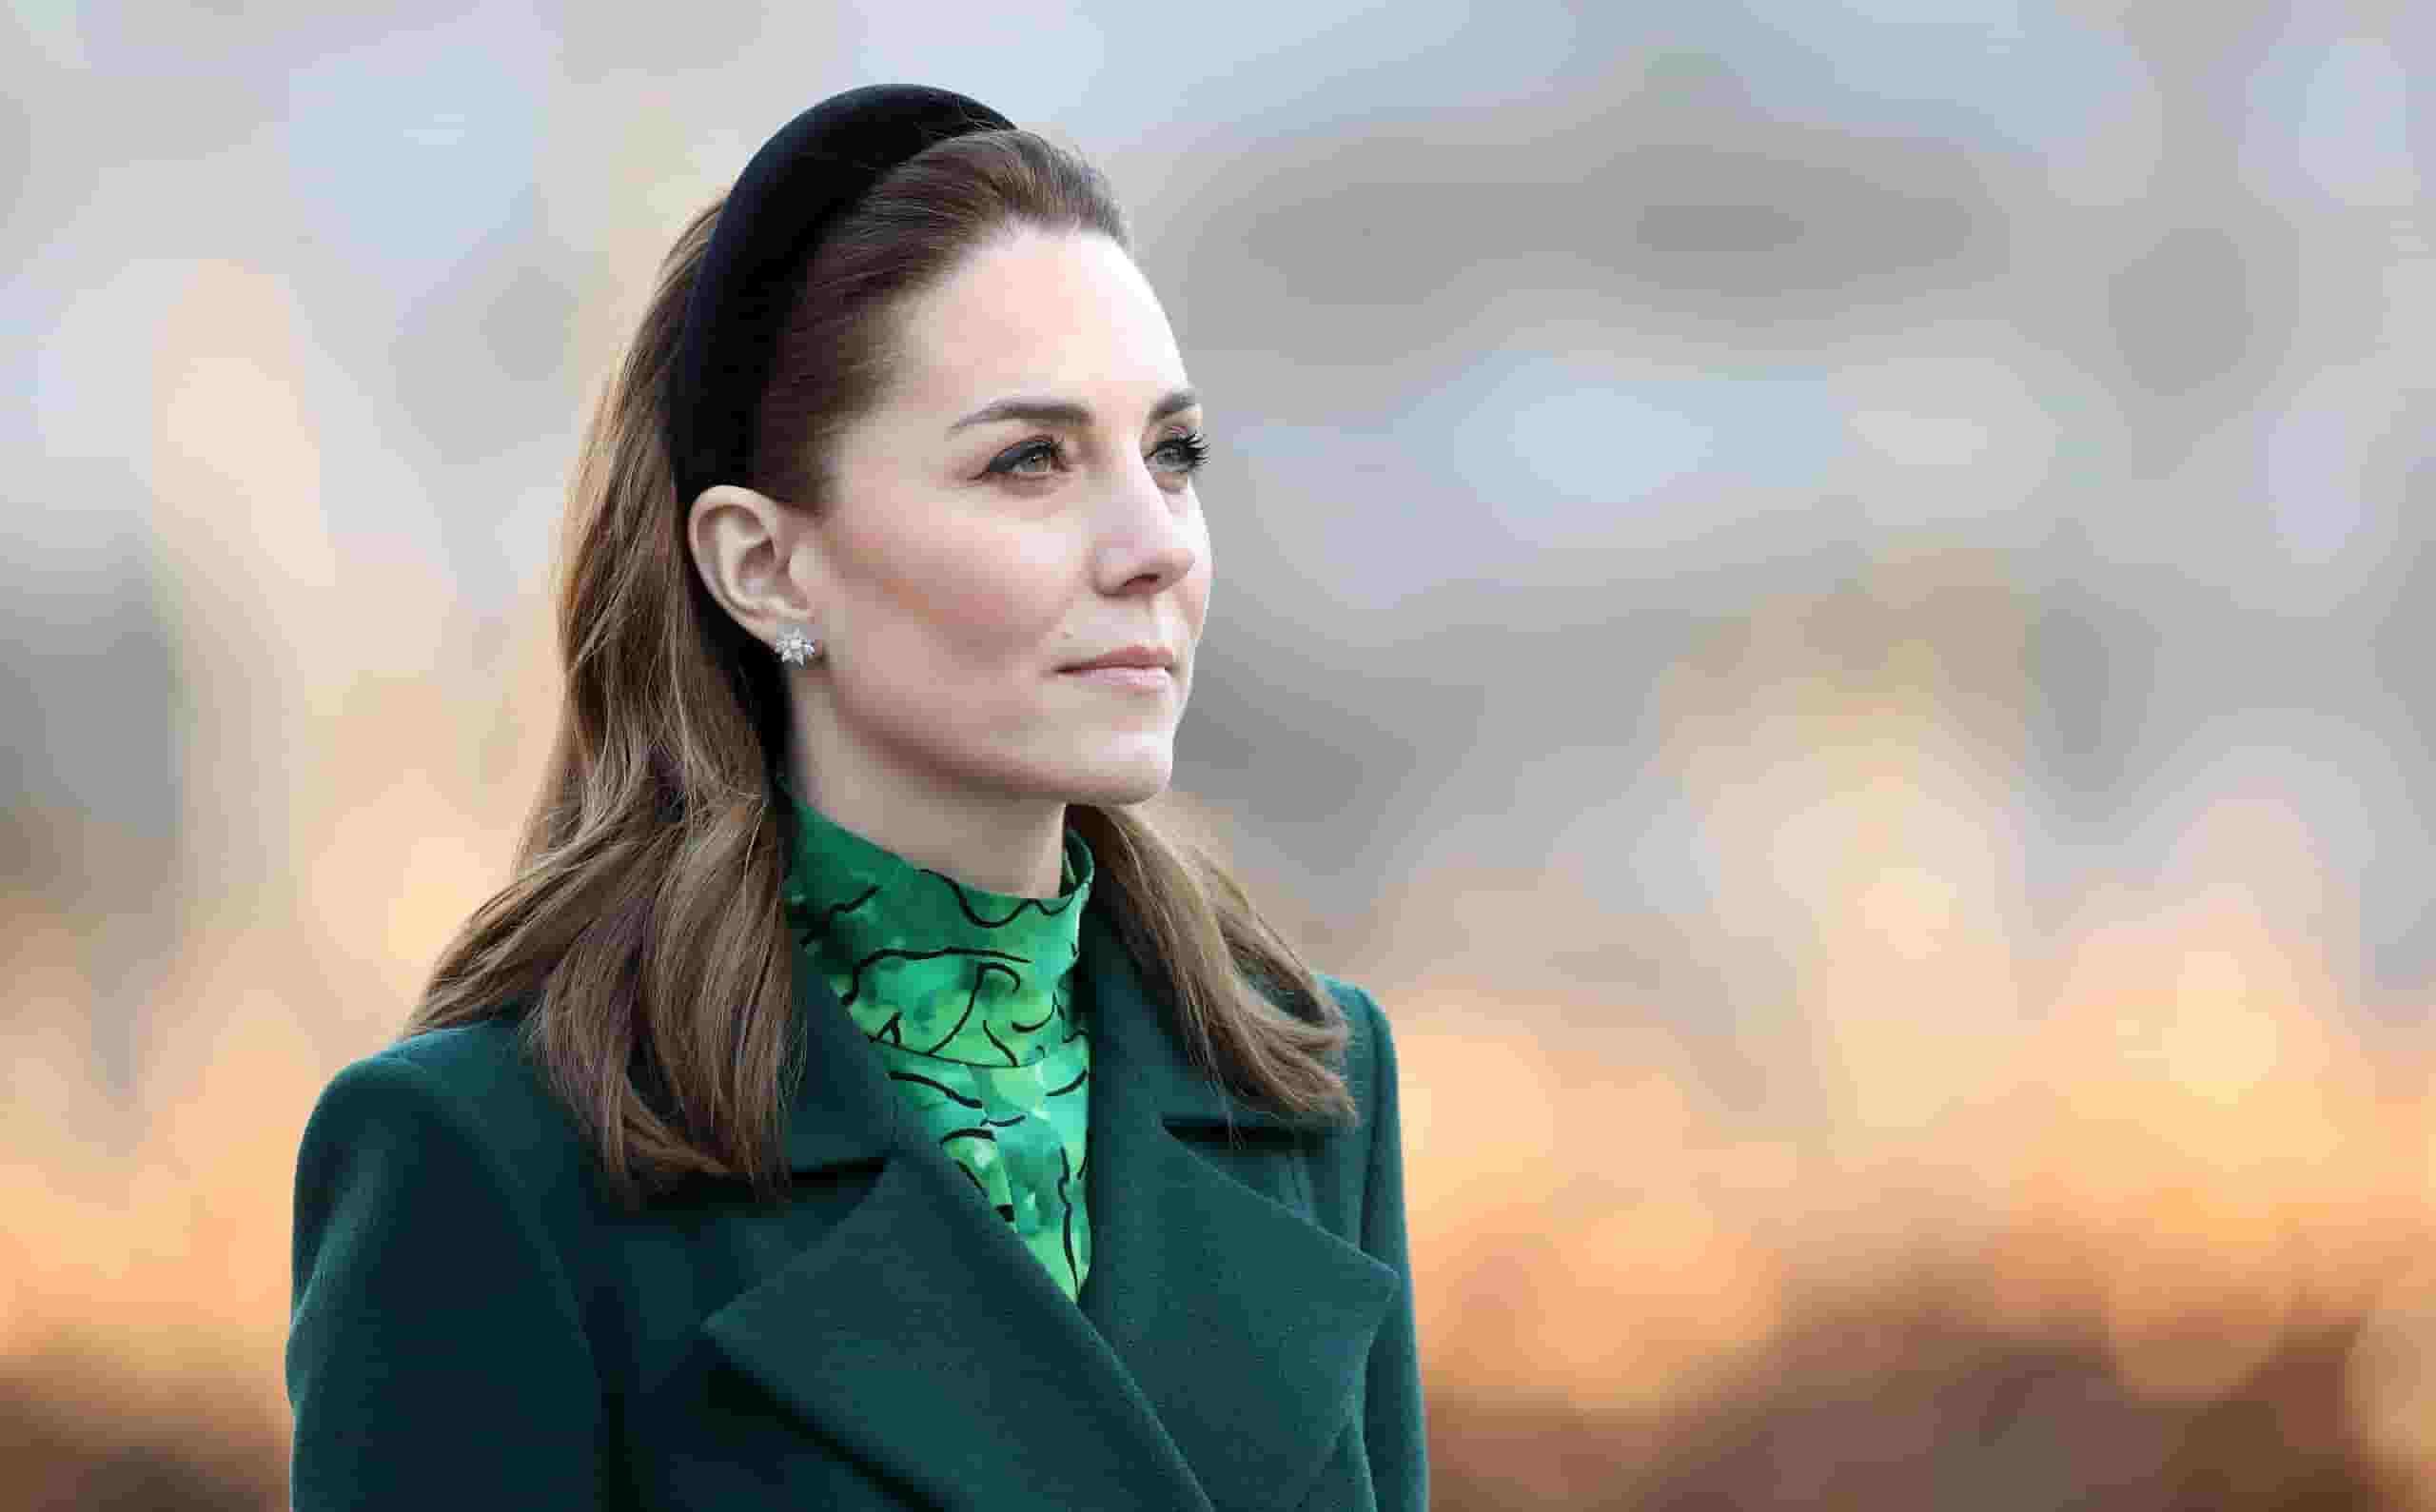 Kate Middleton criticized for her public behavior